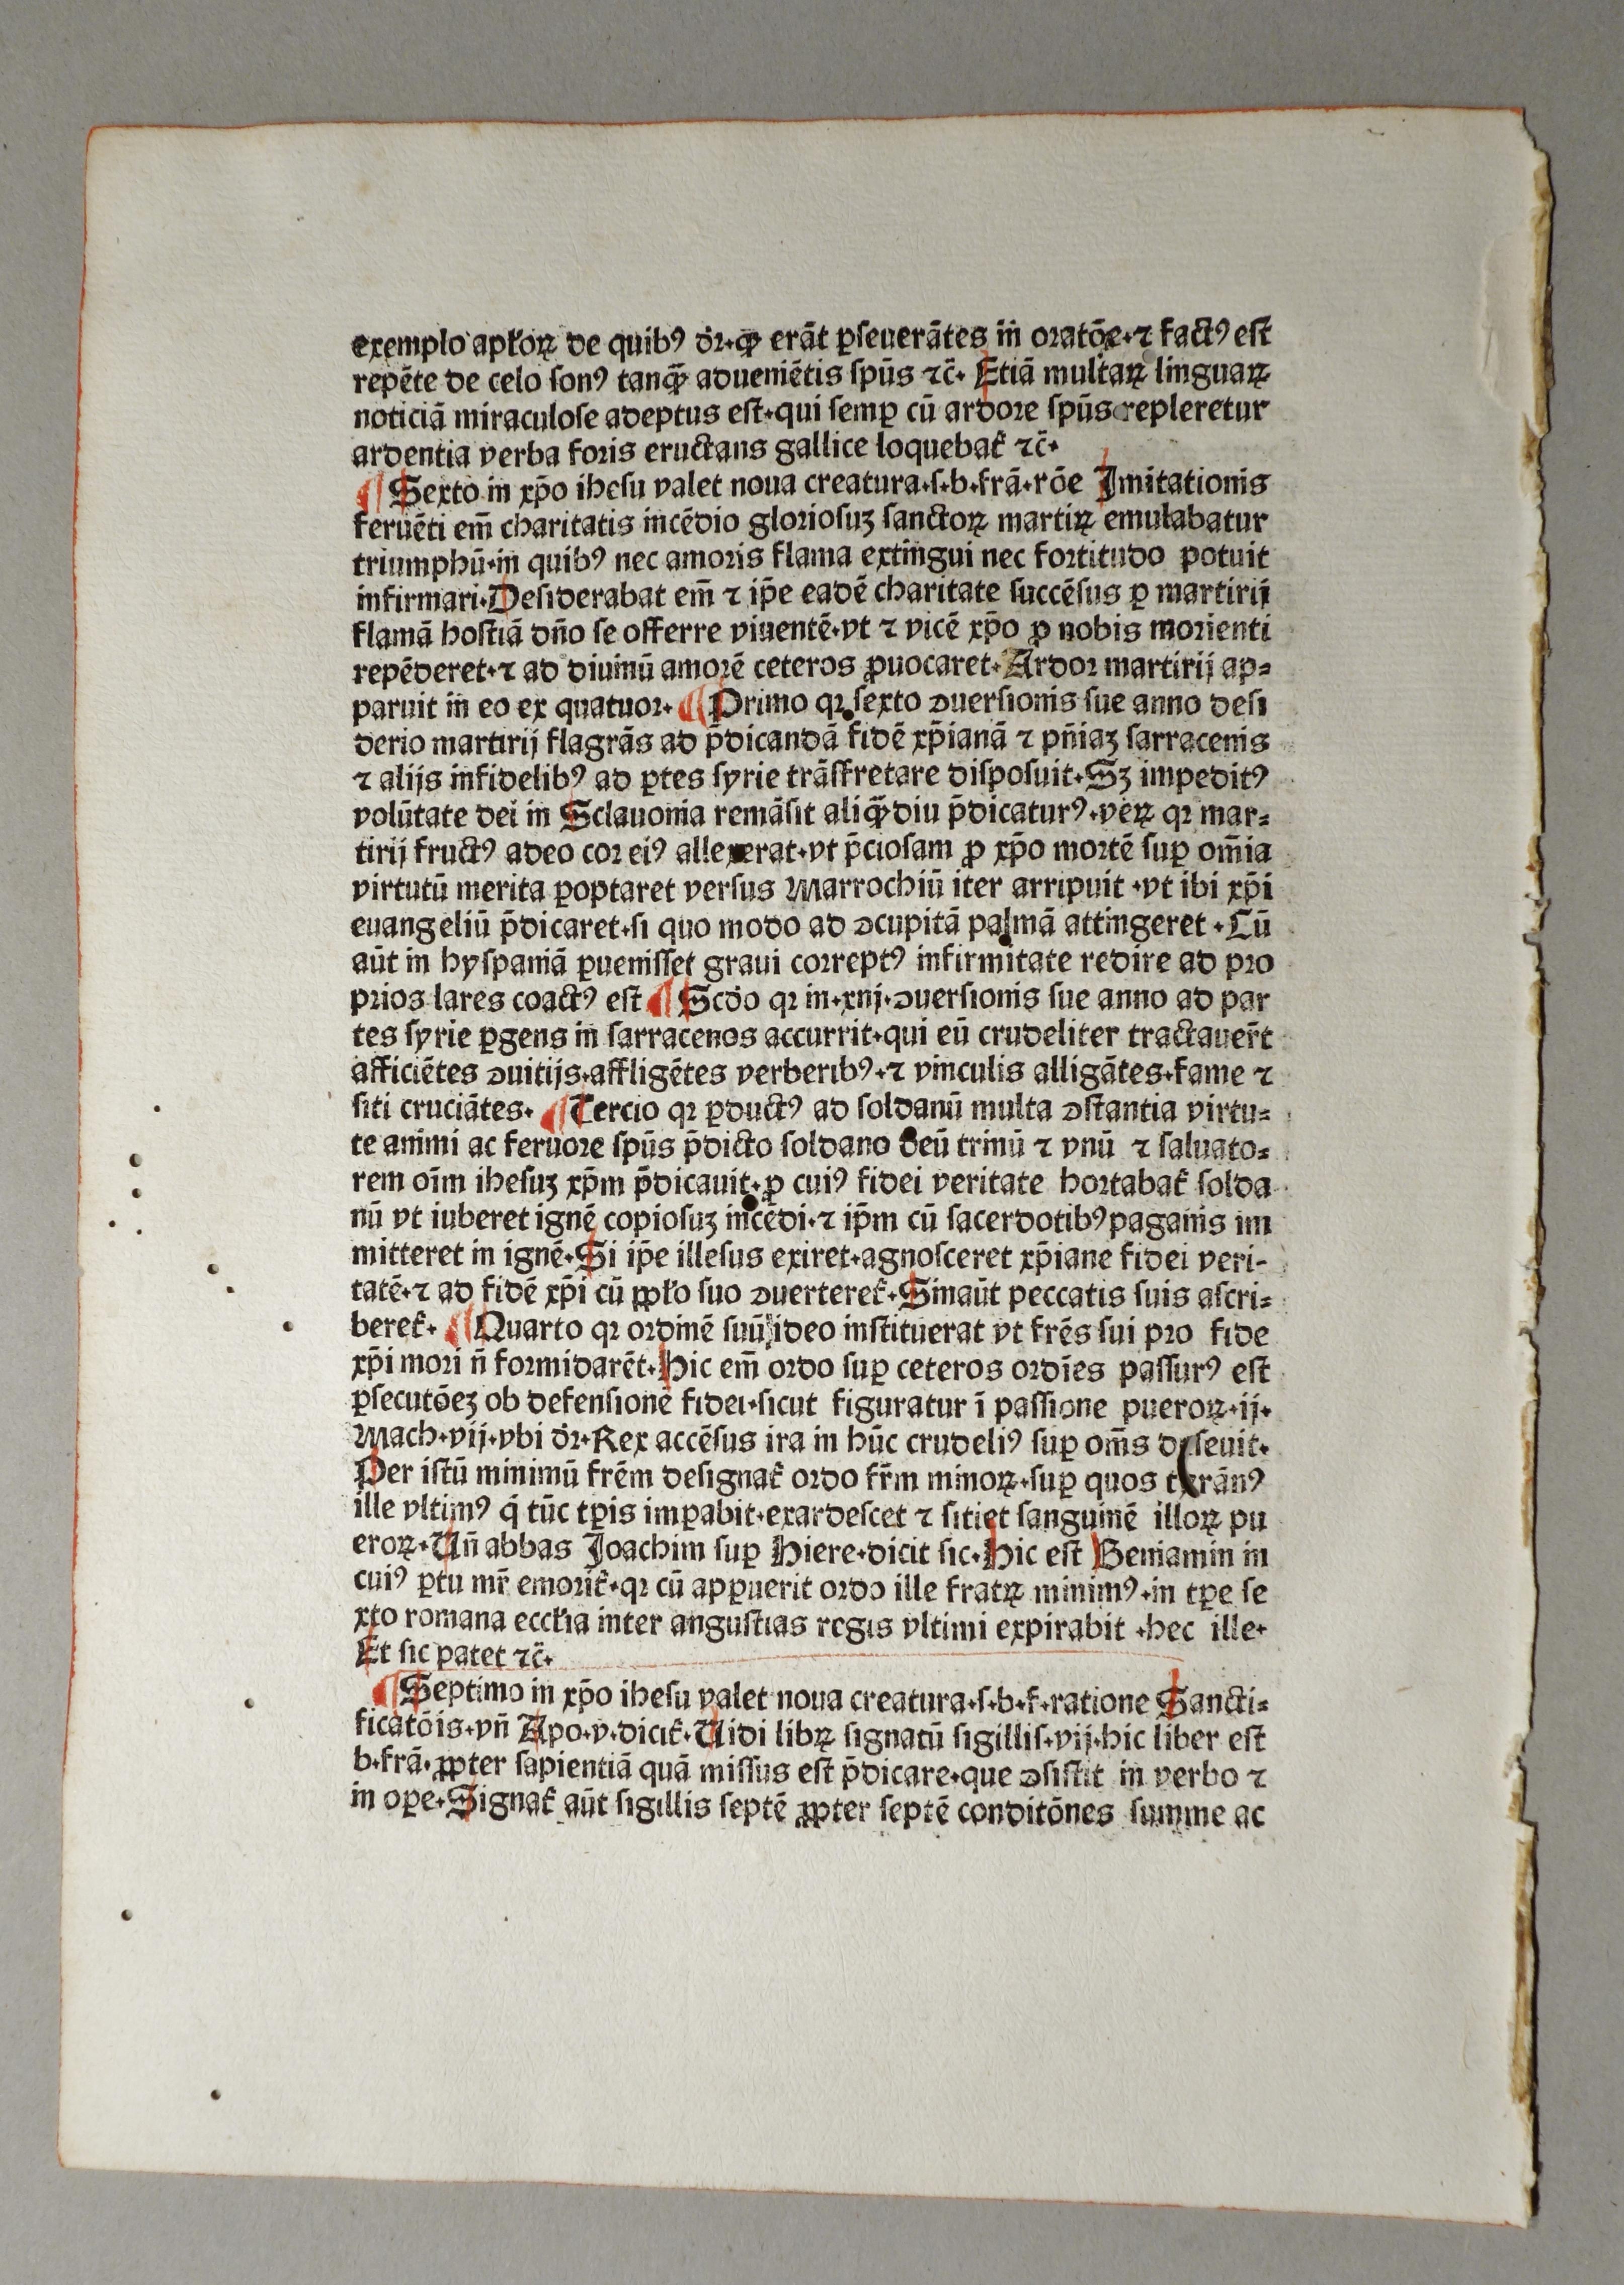 Sermones aurei de sanctis. (GW M17901, H: Leonardus de Utino